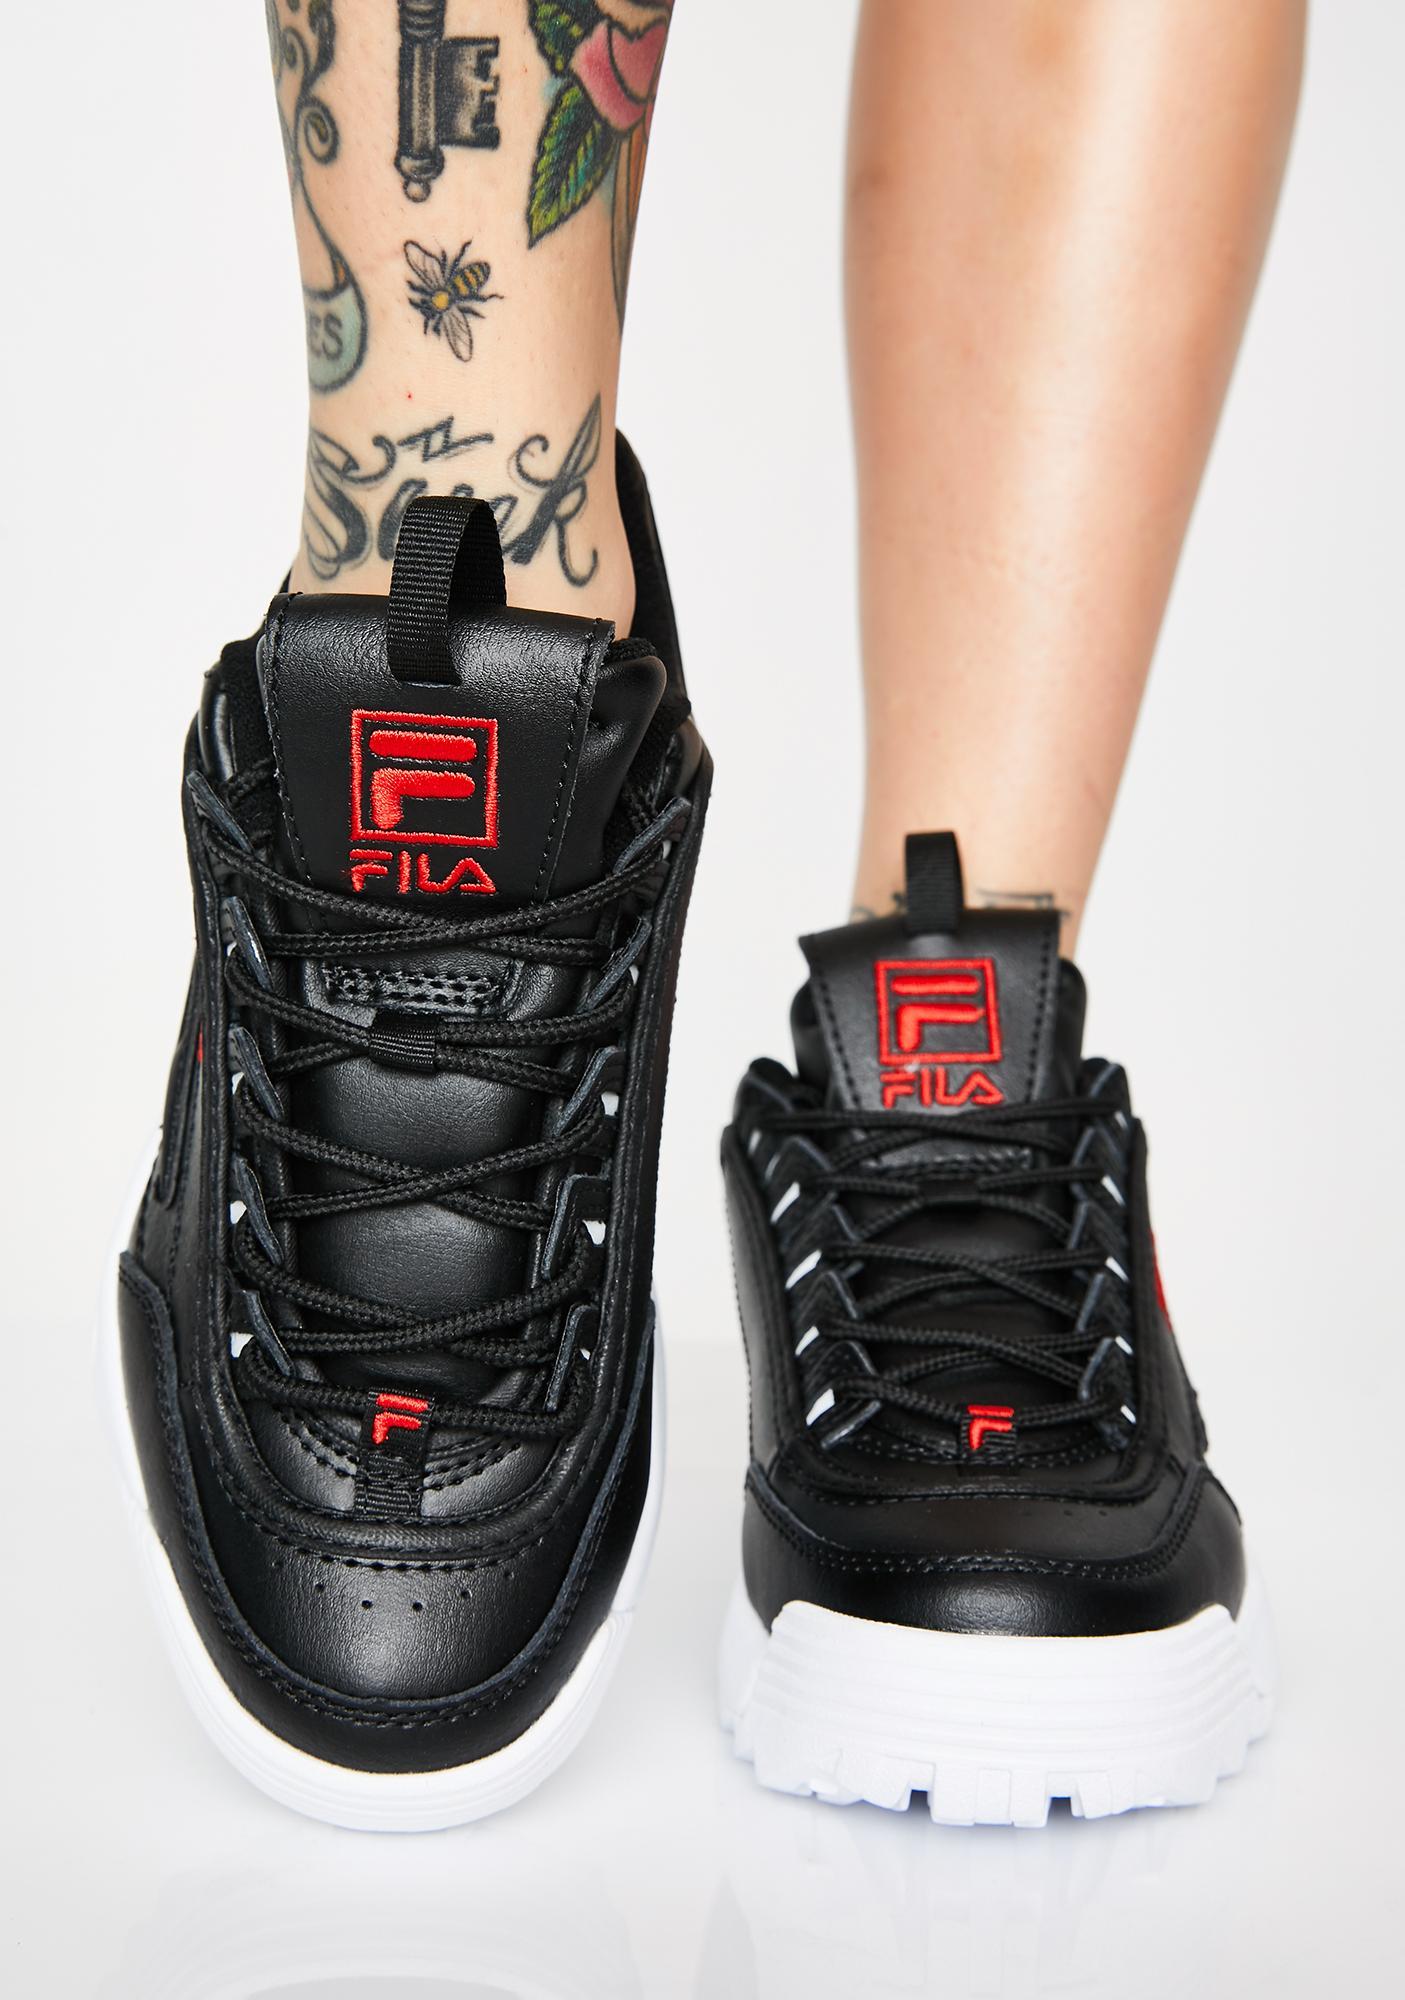 Fila Blackout Disruptor II Premium Sneakers